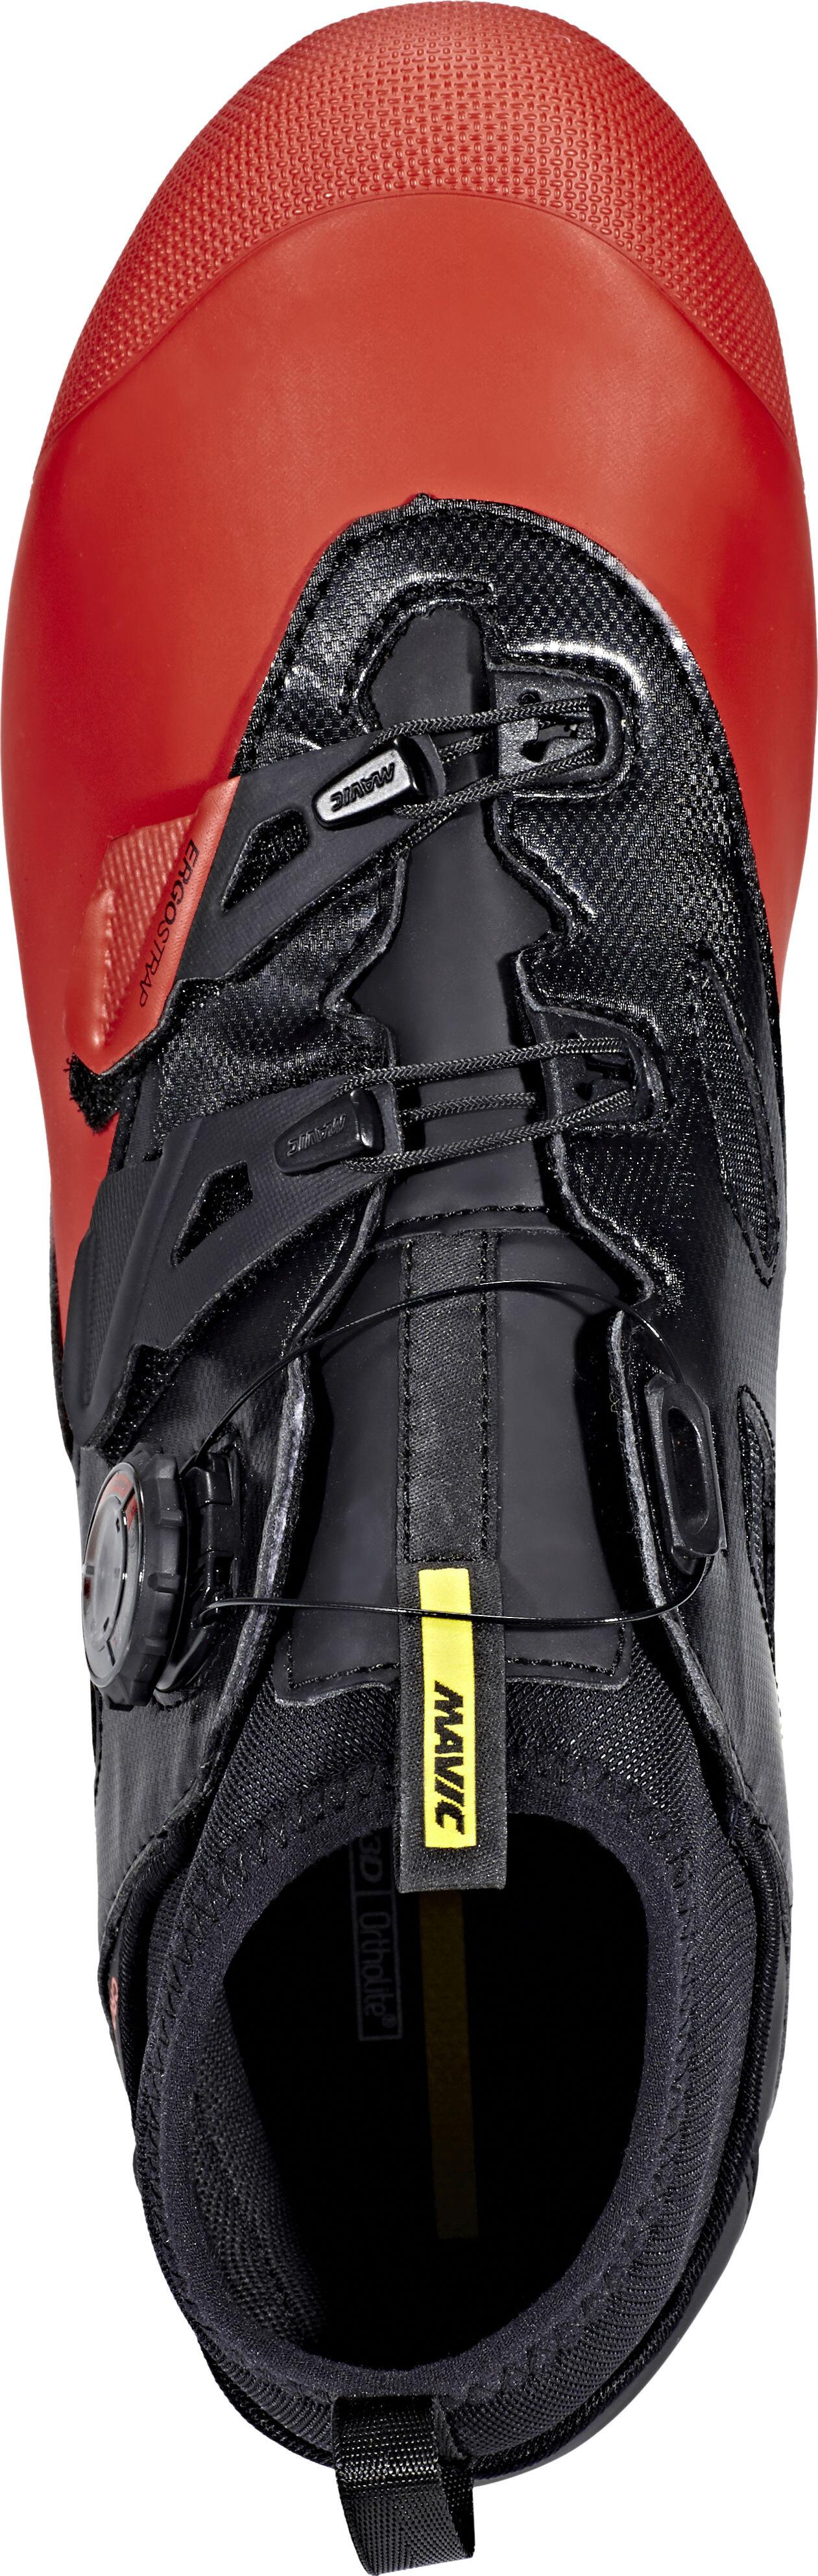 7ba4be8dced Mavic Crossmax Elite CM Shoes black/fiery red/black at Bikester.co.uk